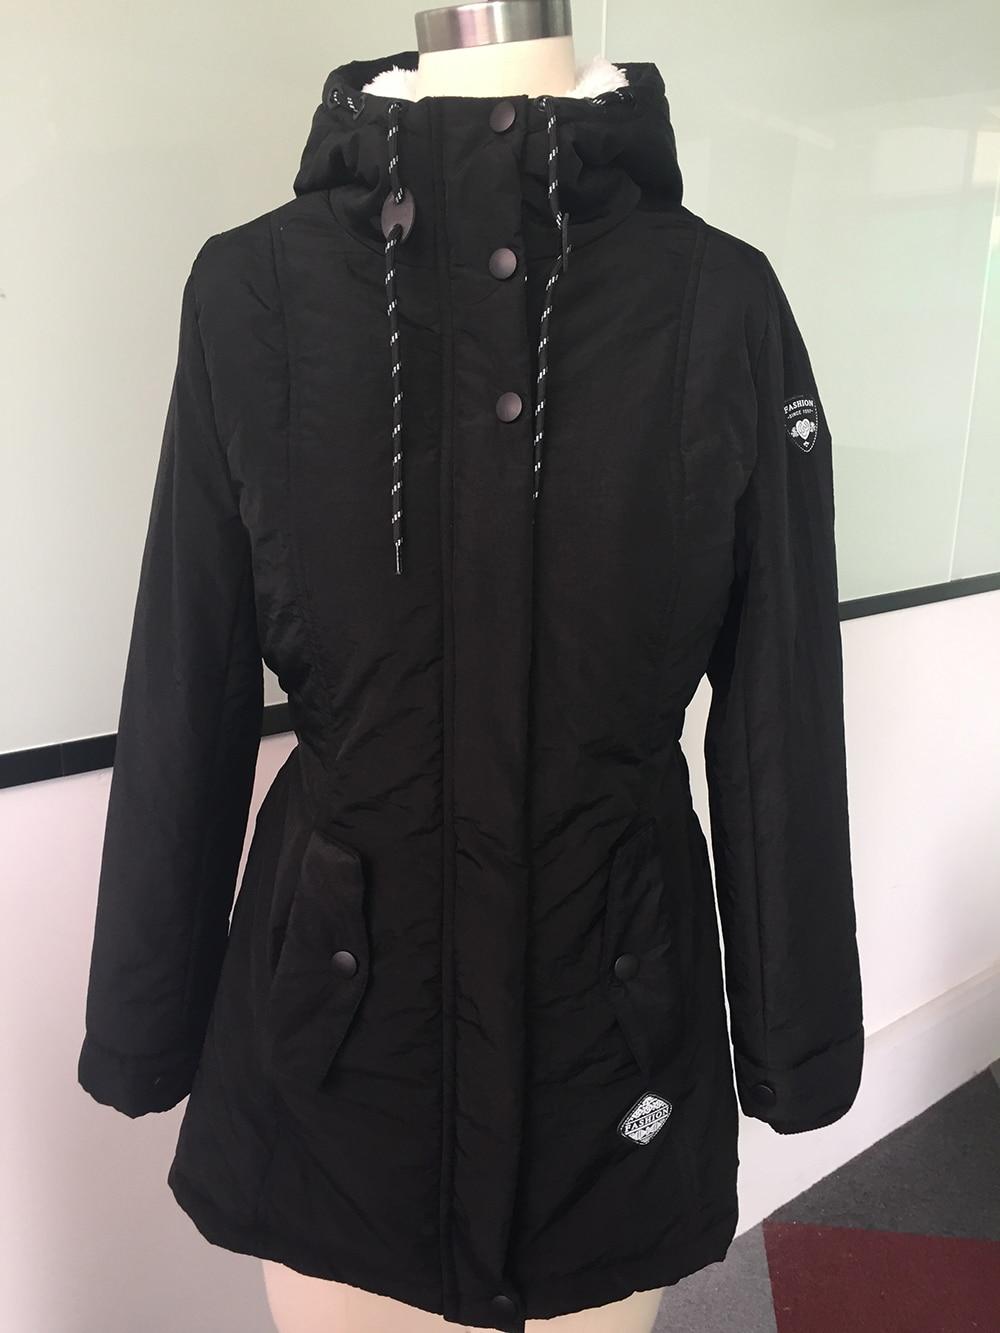 Winter Warm Coat Female Windproof Slim Outerwear Fashion Elastic Waist Zipper Pocket Hooded Drawstring Overcoats Autumn Clothes 2